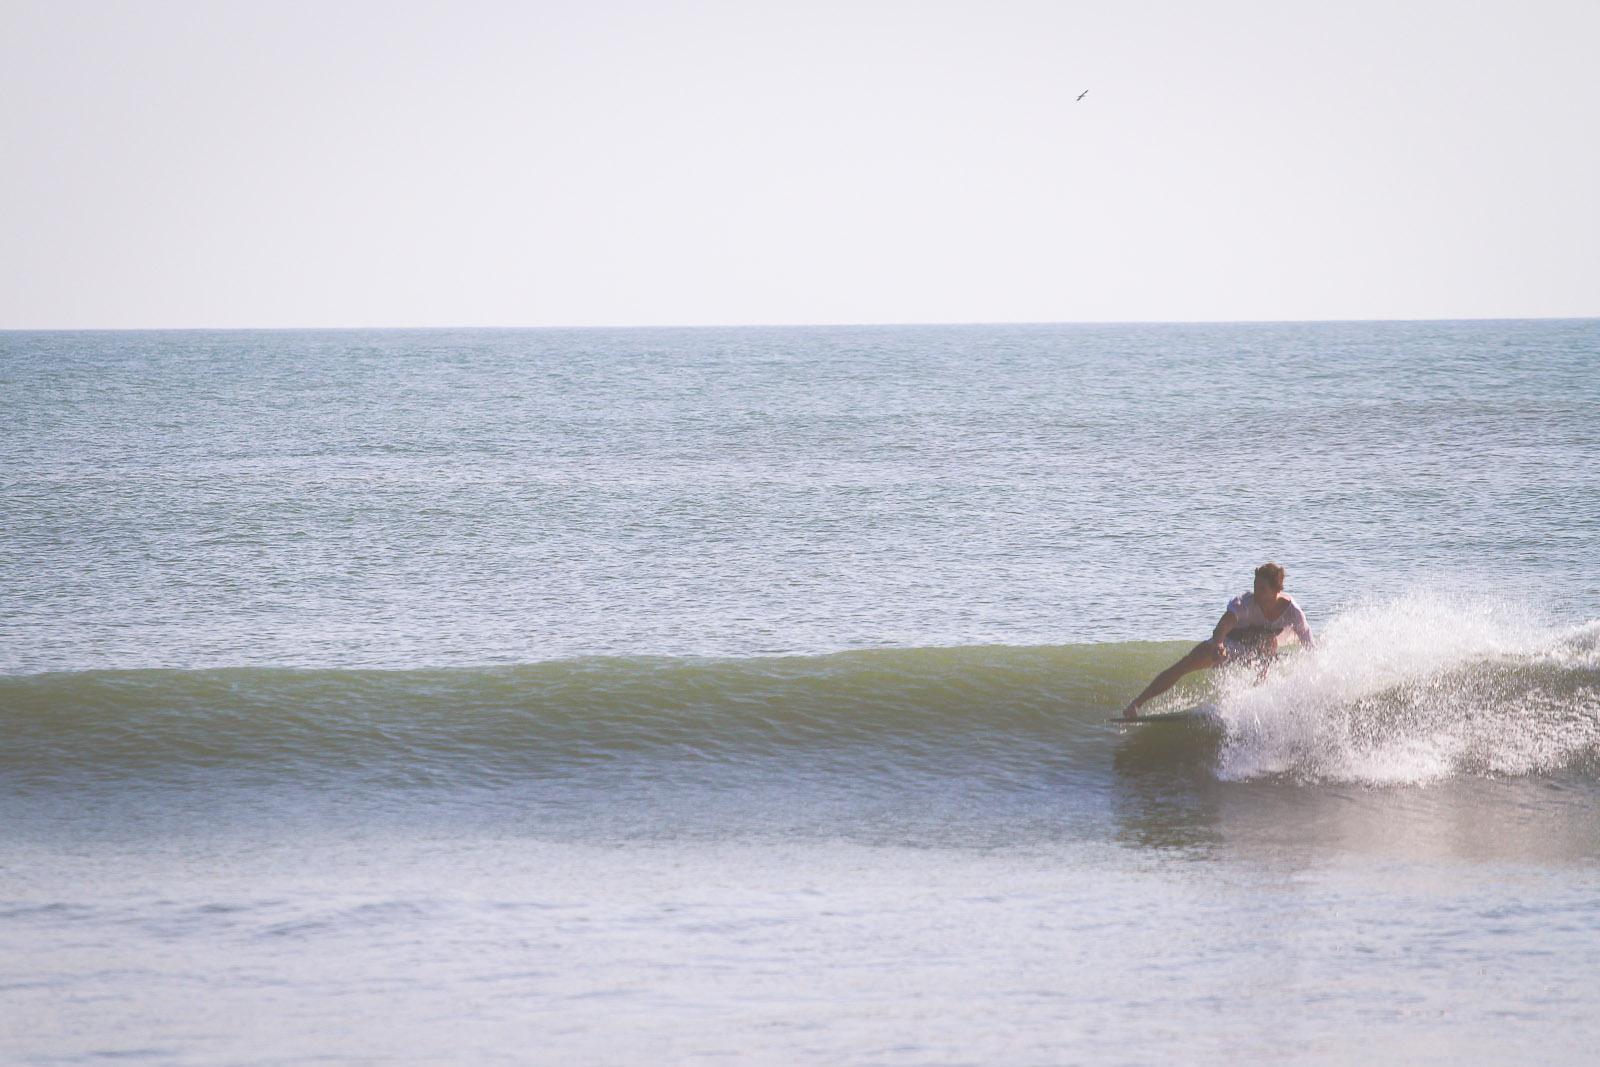 Sunshinestories-surf-travel-blog-IMG_9312